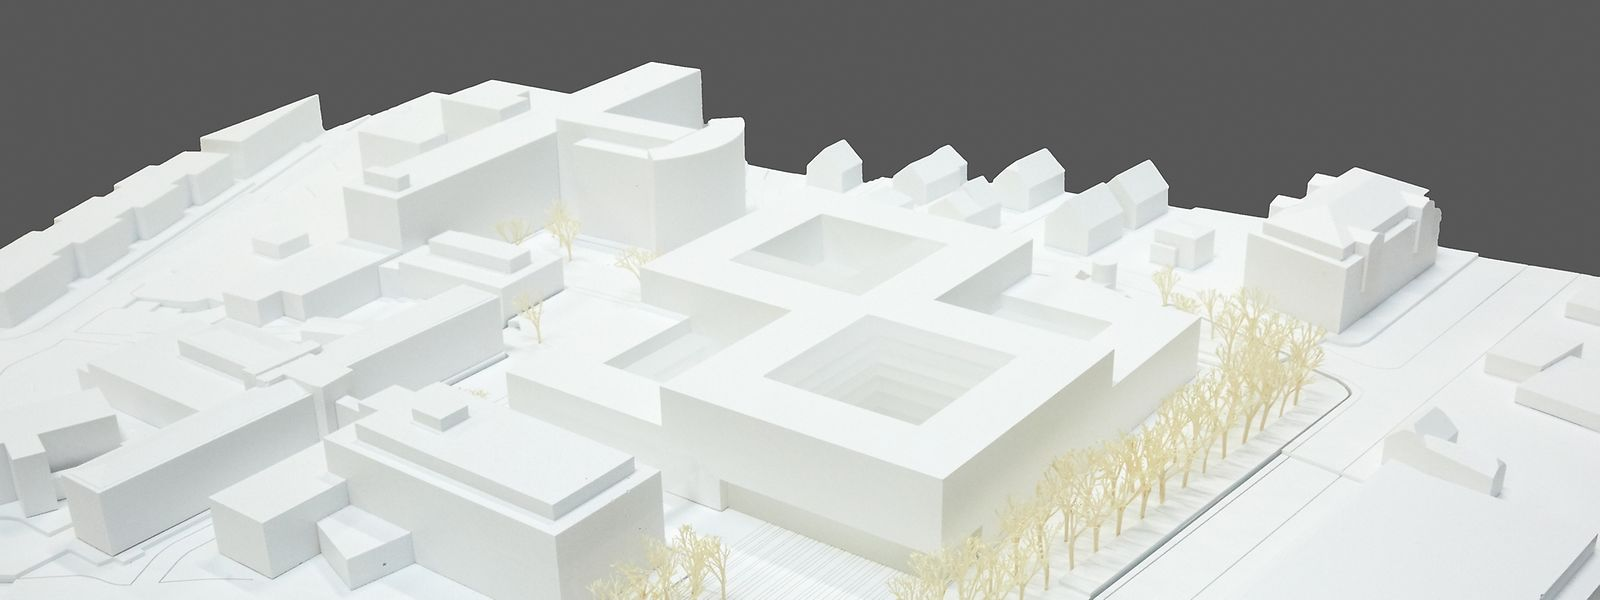 "Der erste Preis geht an das Projekt des Teams ""M3 Architectes S.A."""